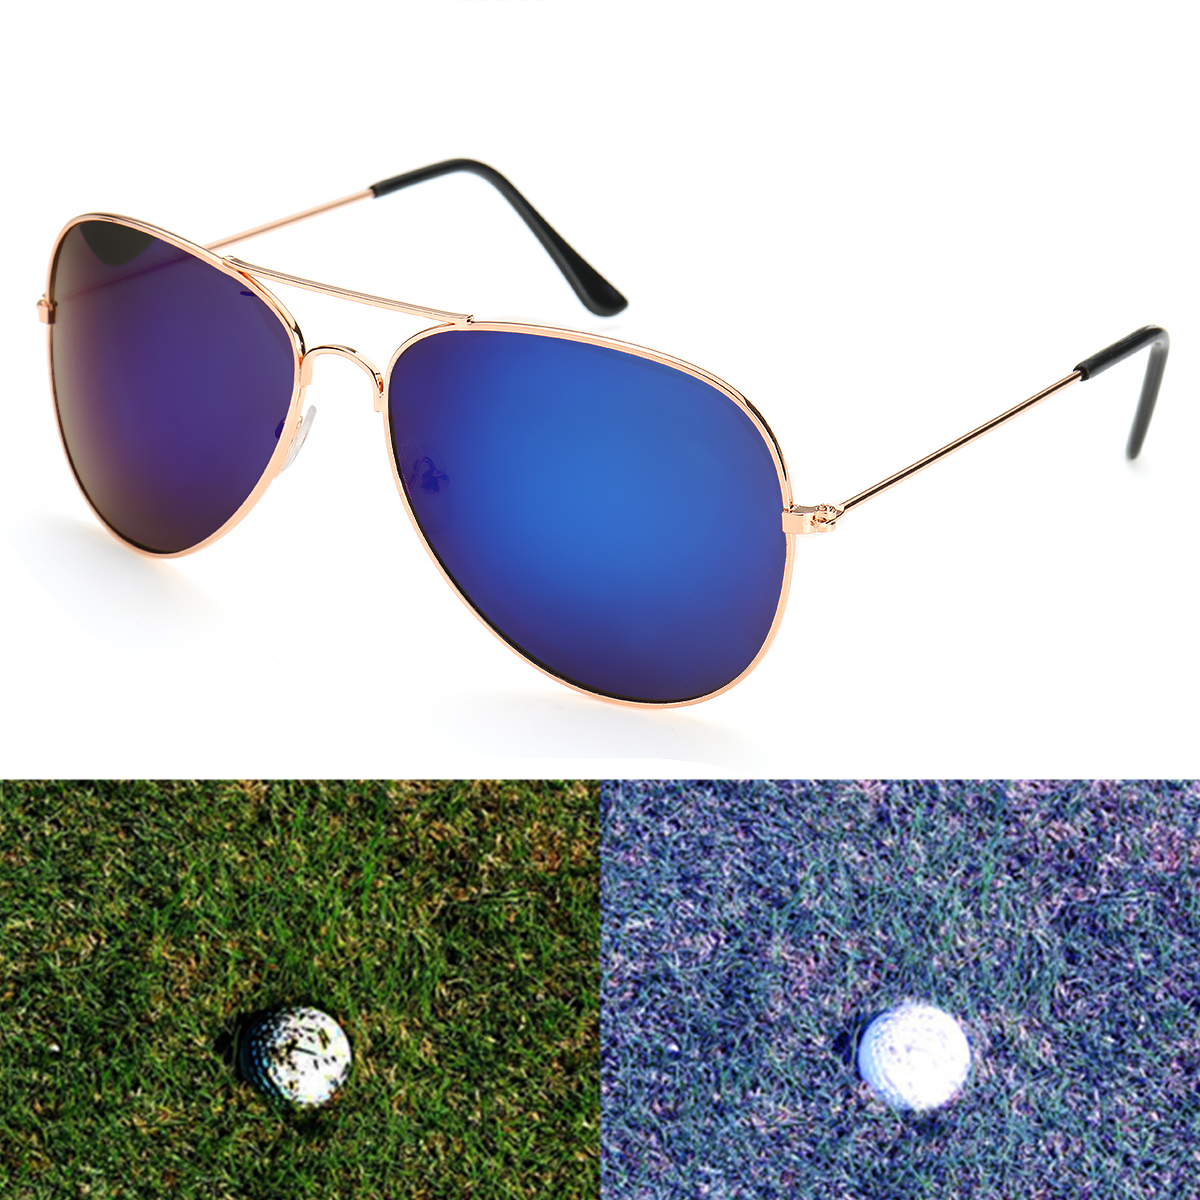 Men Retro Sunglasses Fishing Golf Ball Finder Glasses Eye Protection Golf Accessories Blue Lenses Sport Glasse